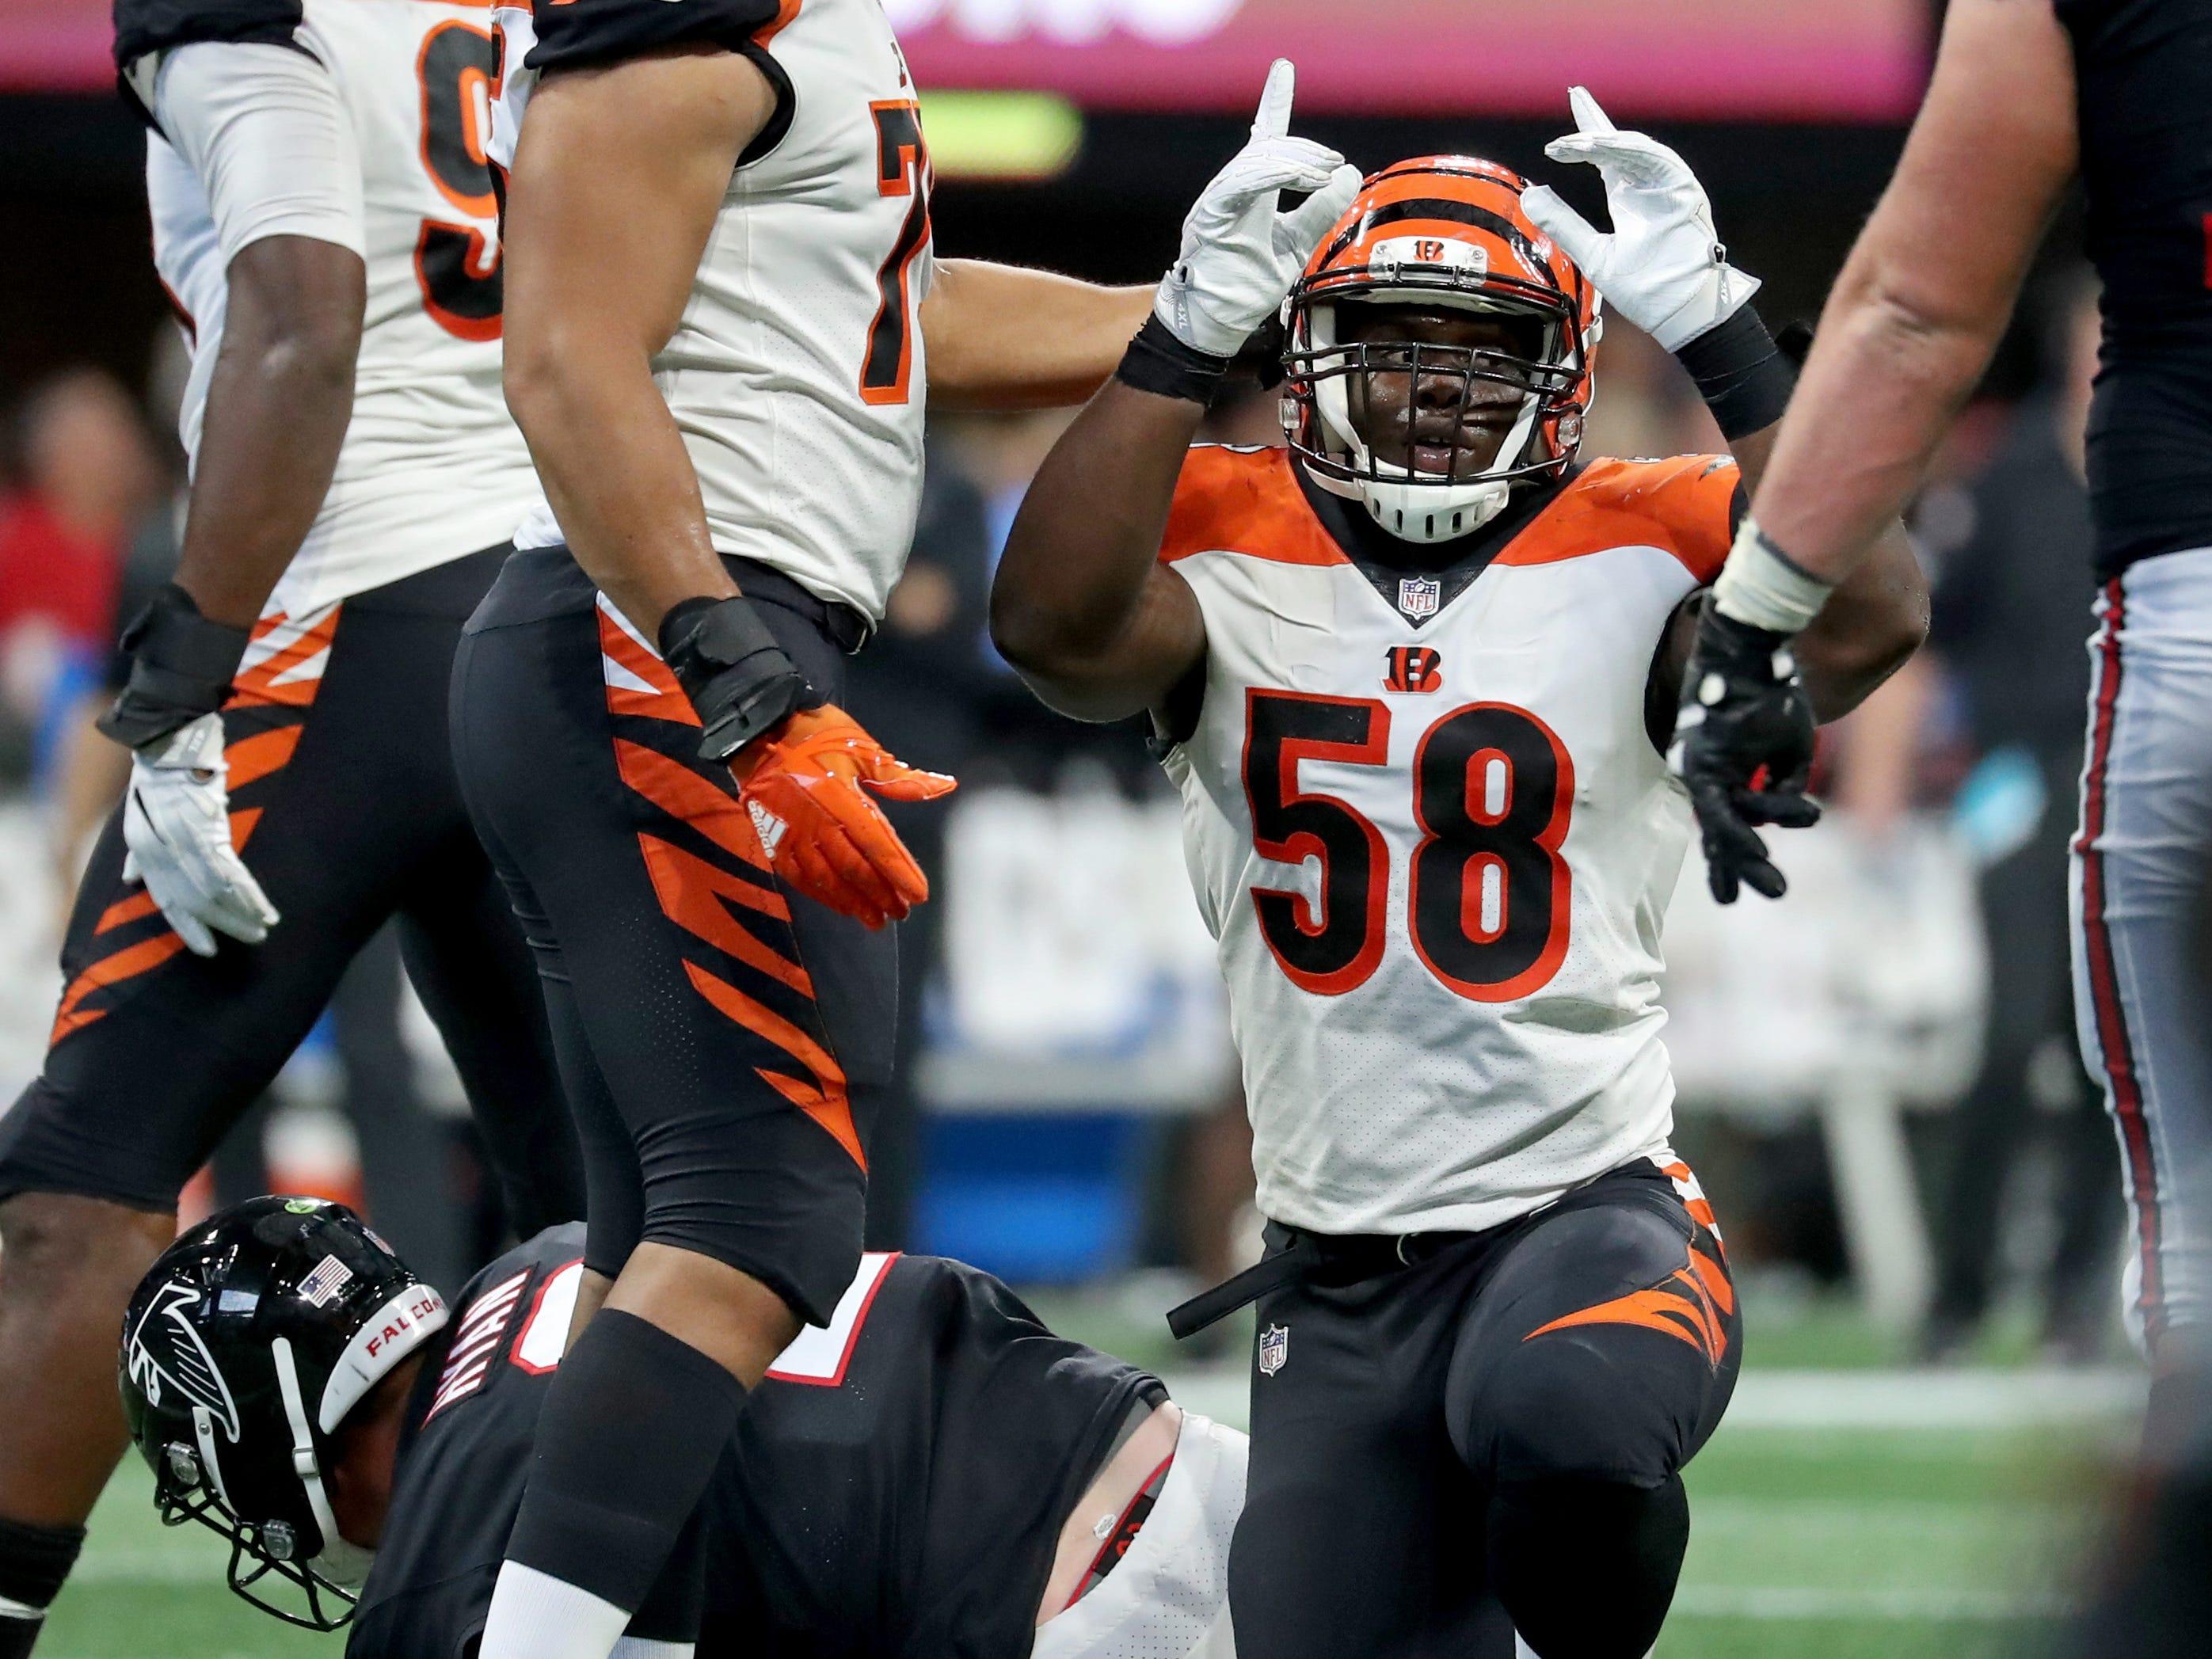 Carl Lawson, DE, Cincinnati Bengals (torn ACL, out for season)